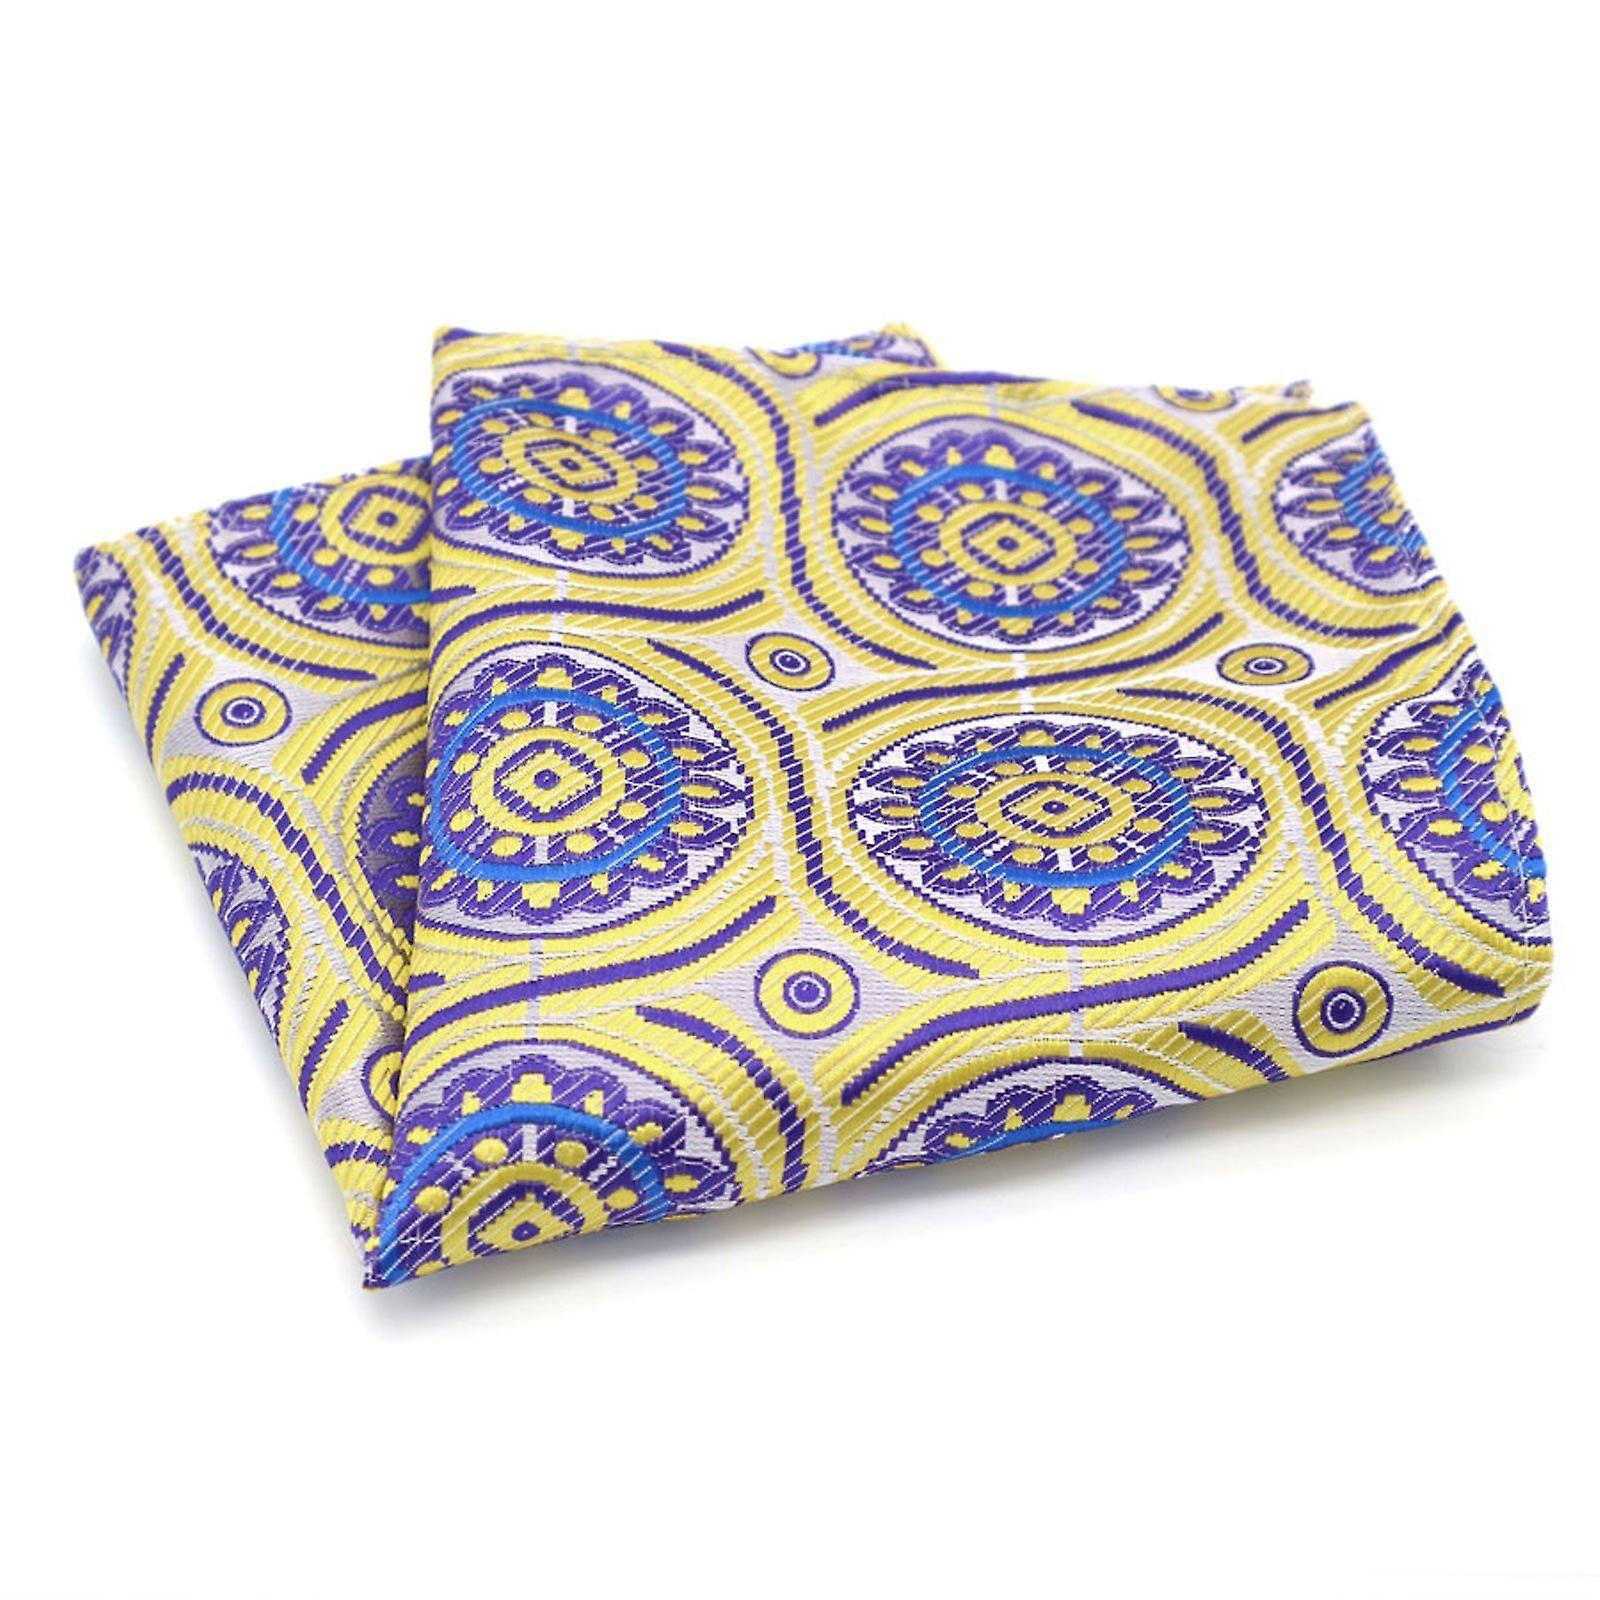 Yellow purple & blue patterned designer pocket square